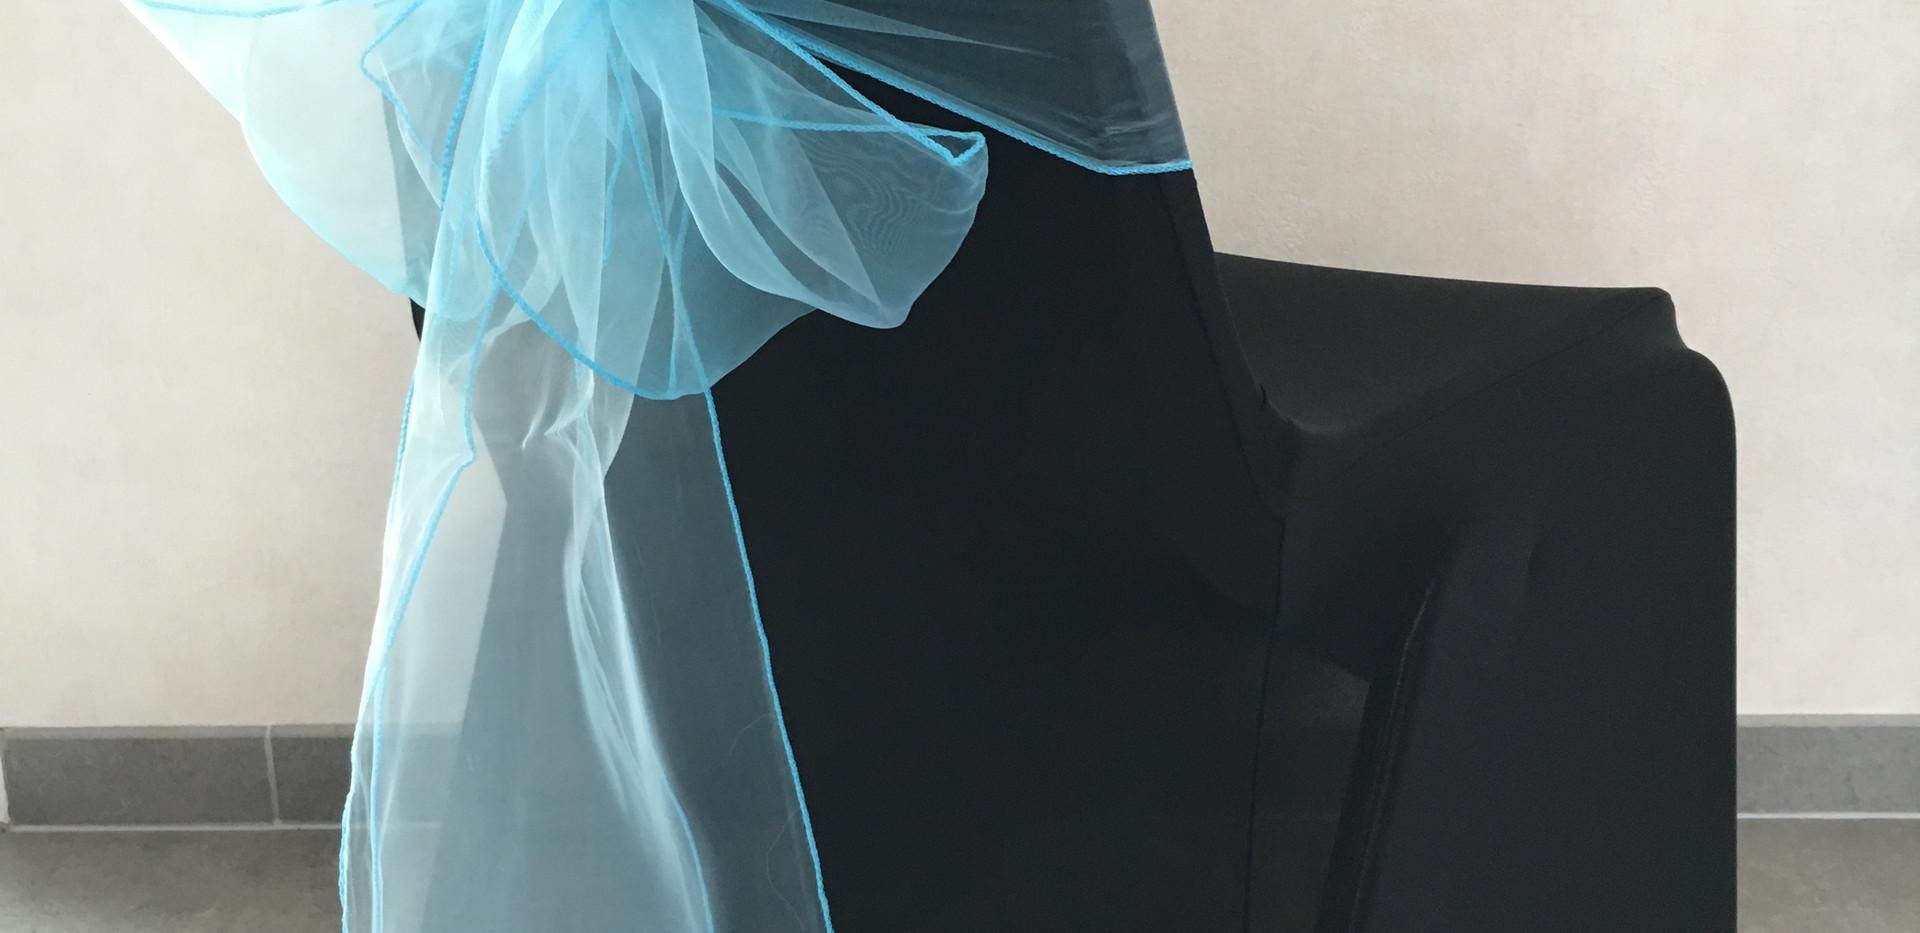 Housse noire Neud Bleu